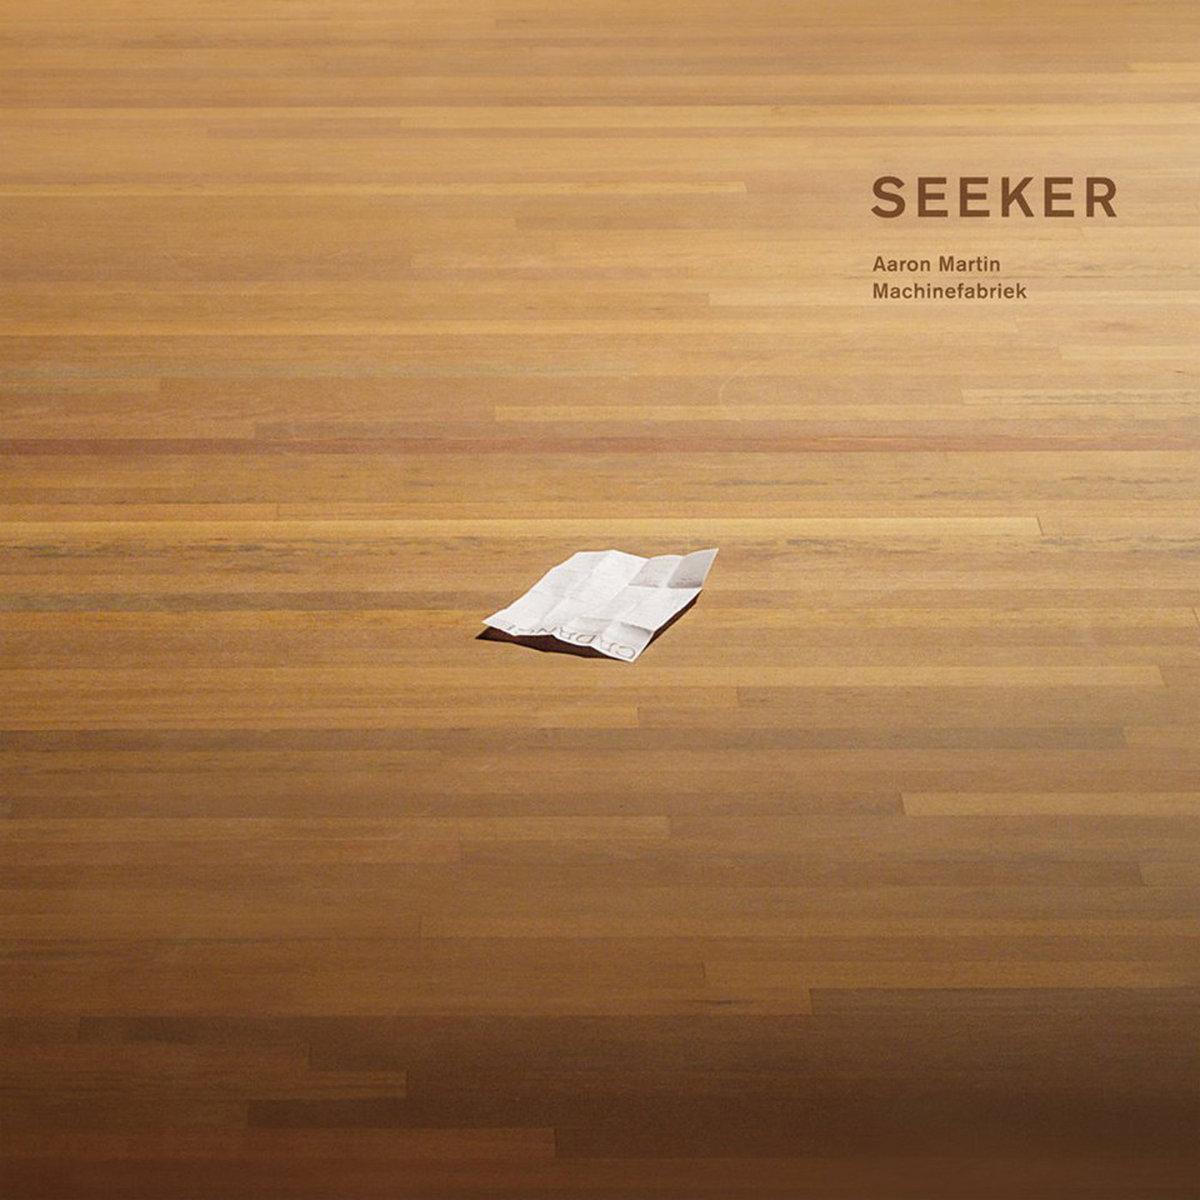 Seeker | Aaron Martin & Machinefabriek | DRONARIVM